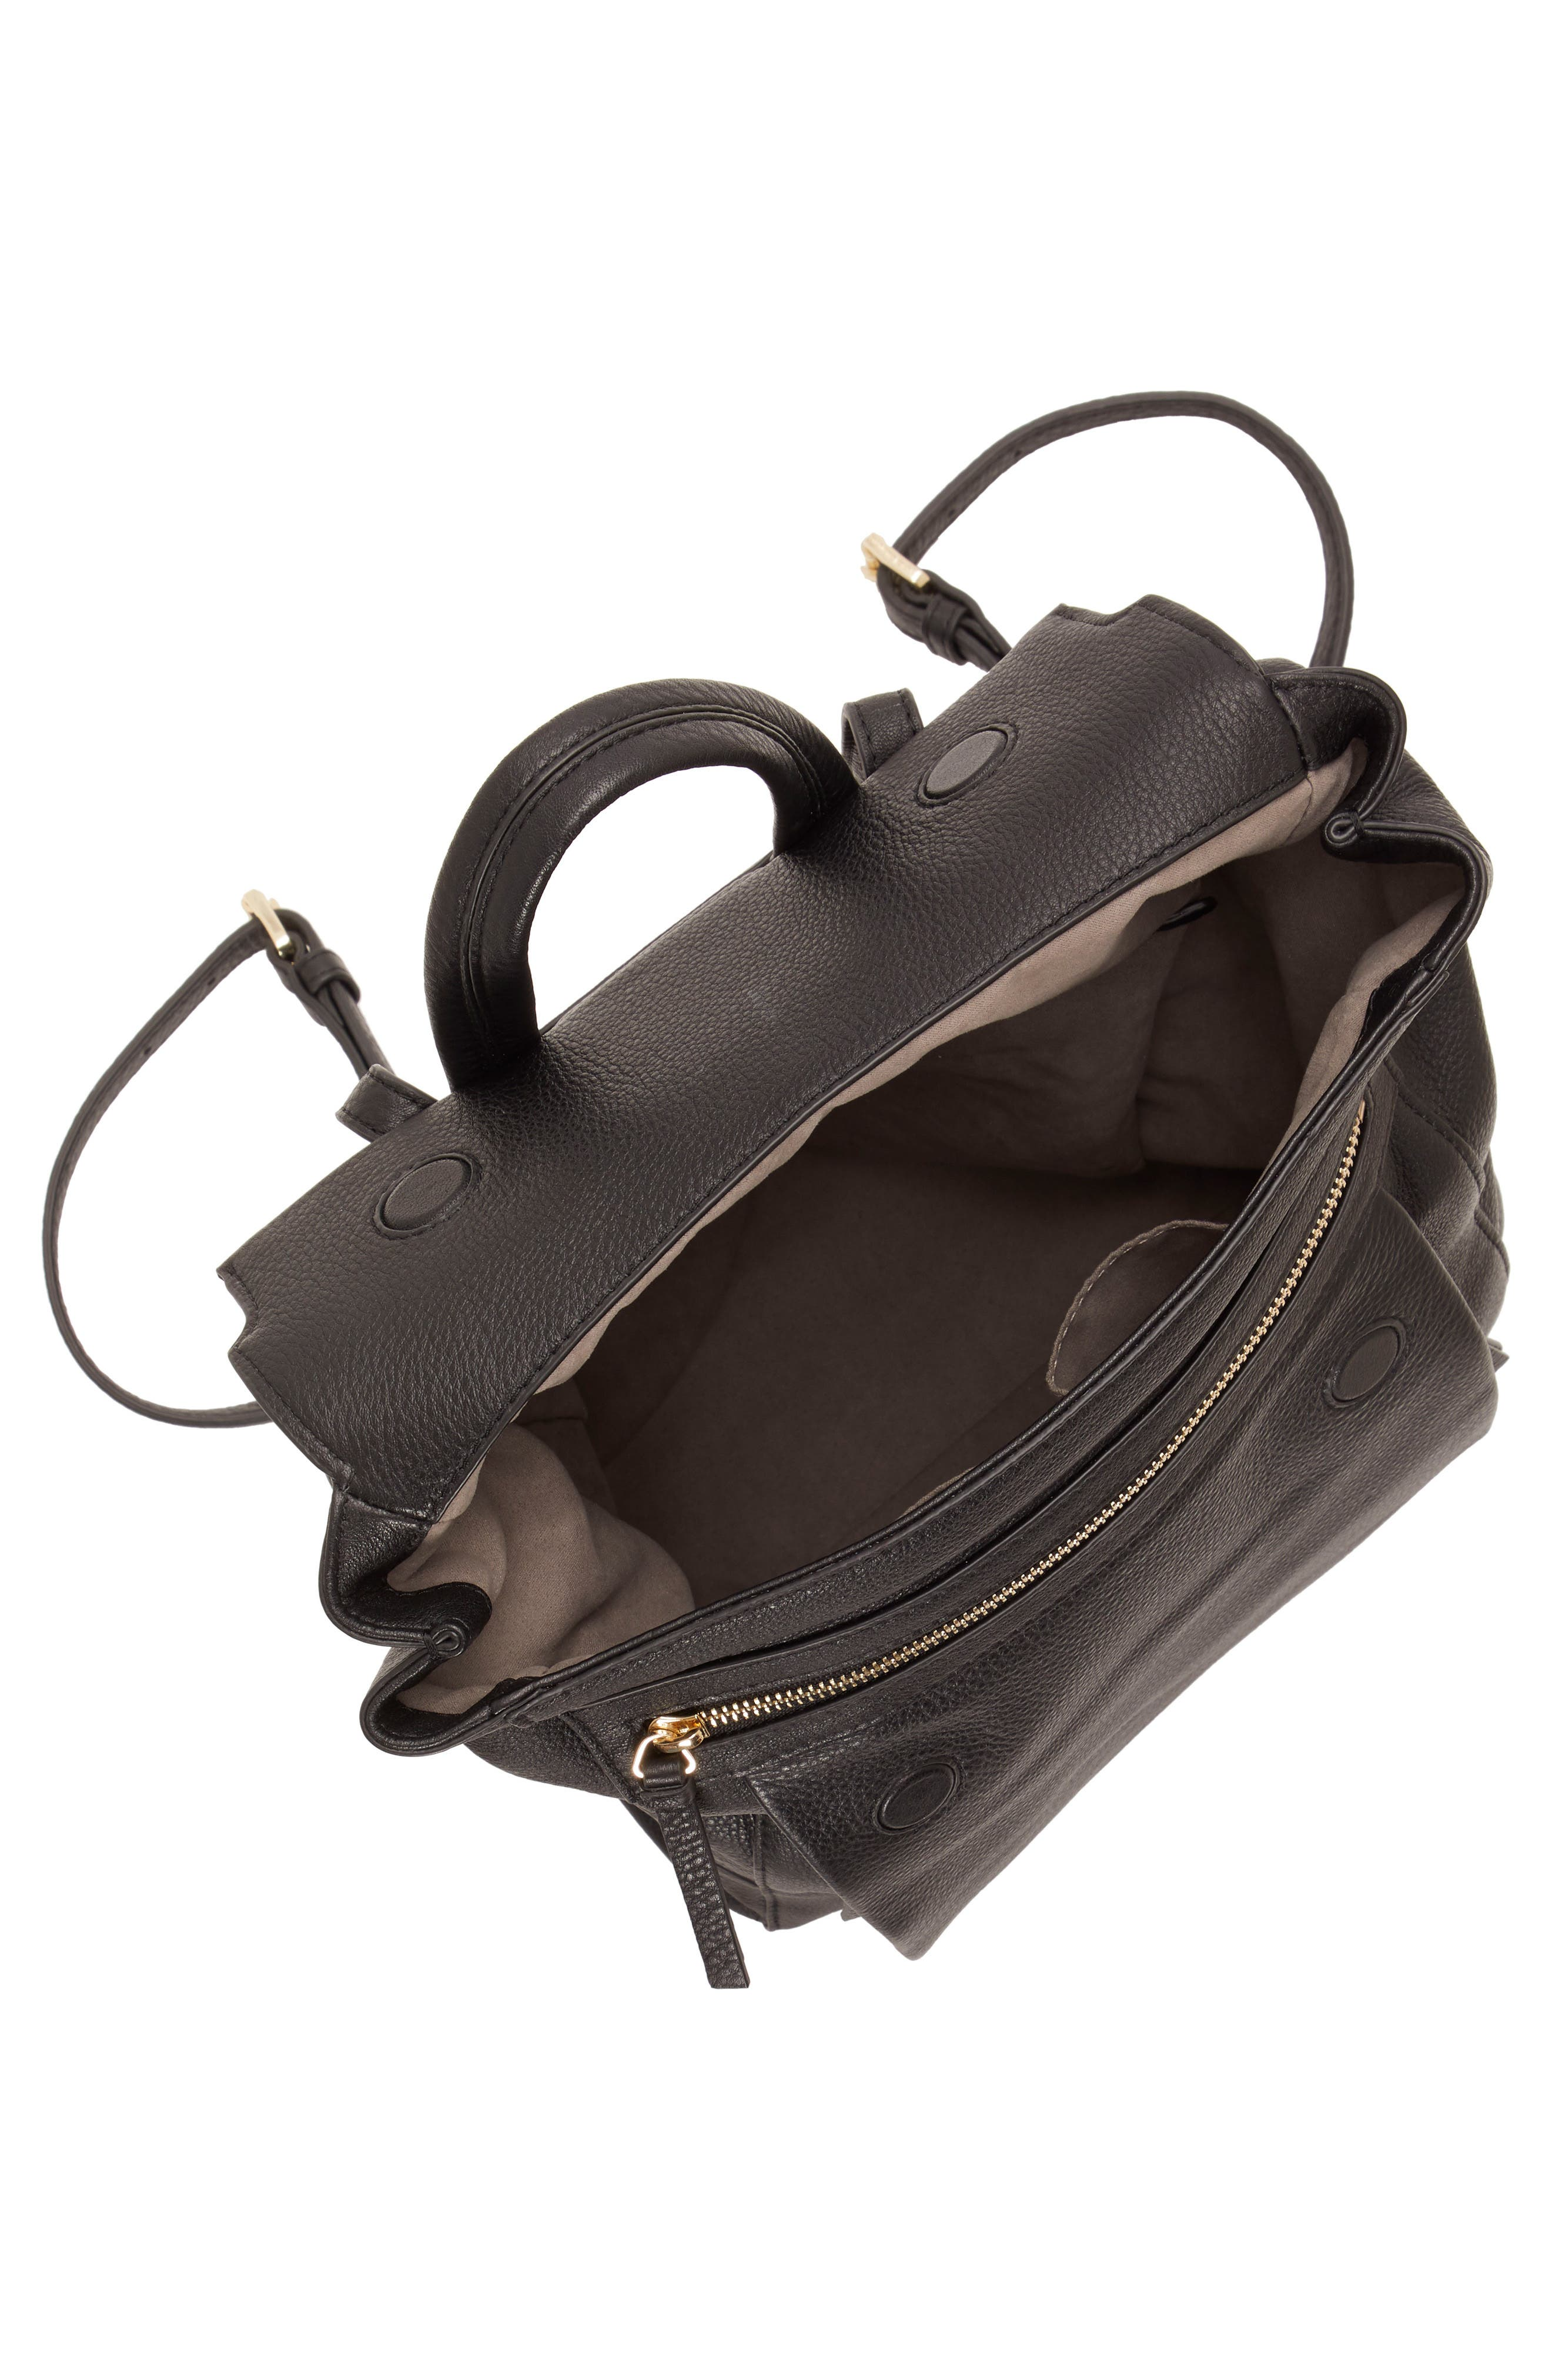 Min Pebbled Leather Backpack,                             Alternate thumbnail 3, color,                             BLACK